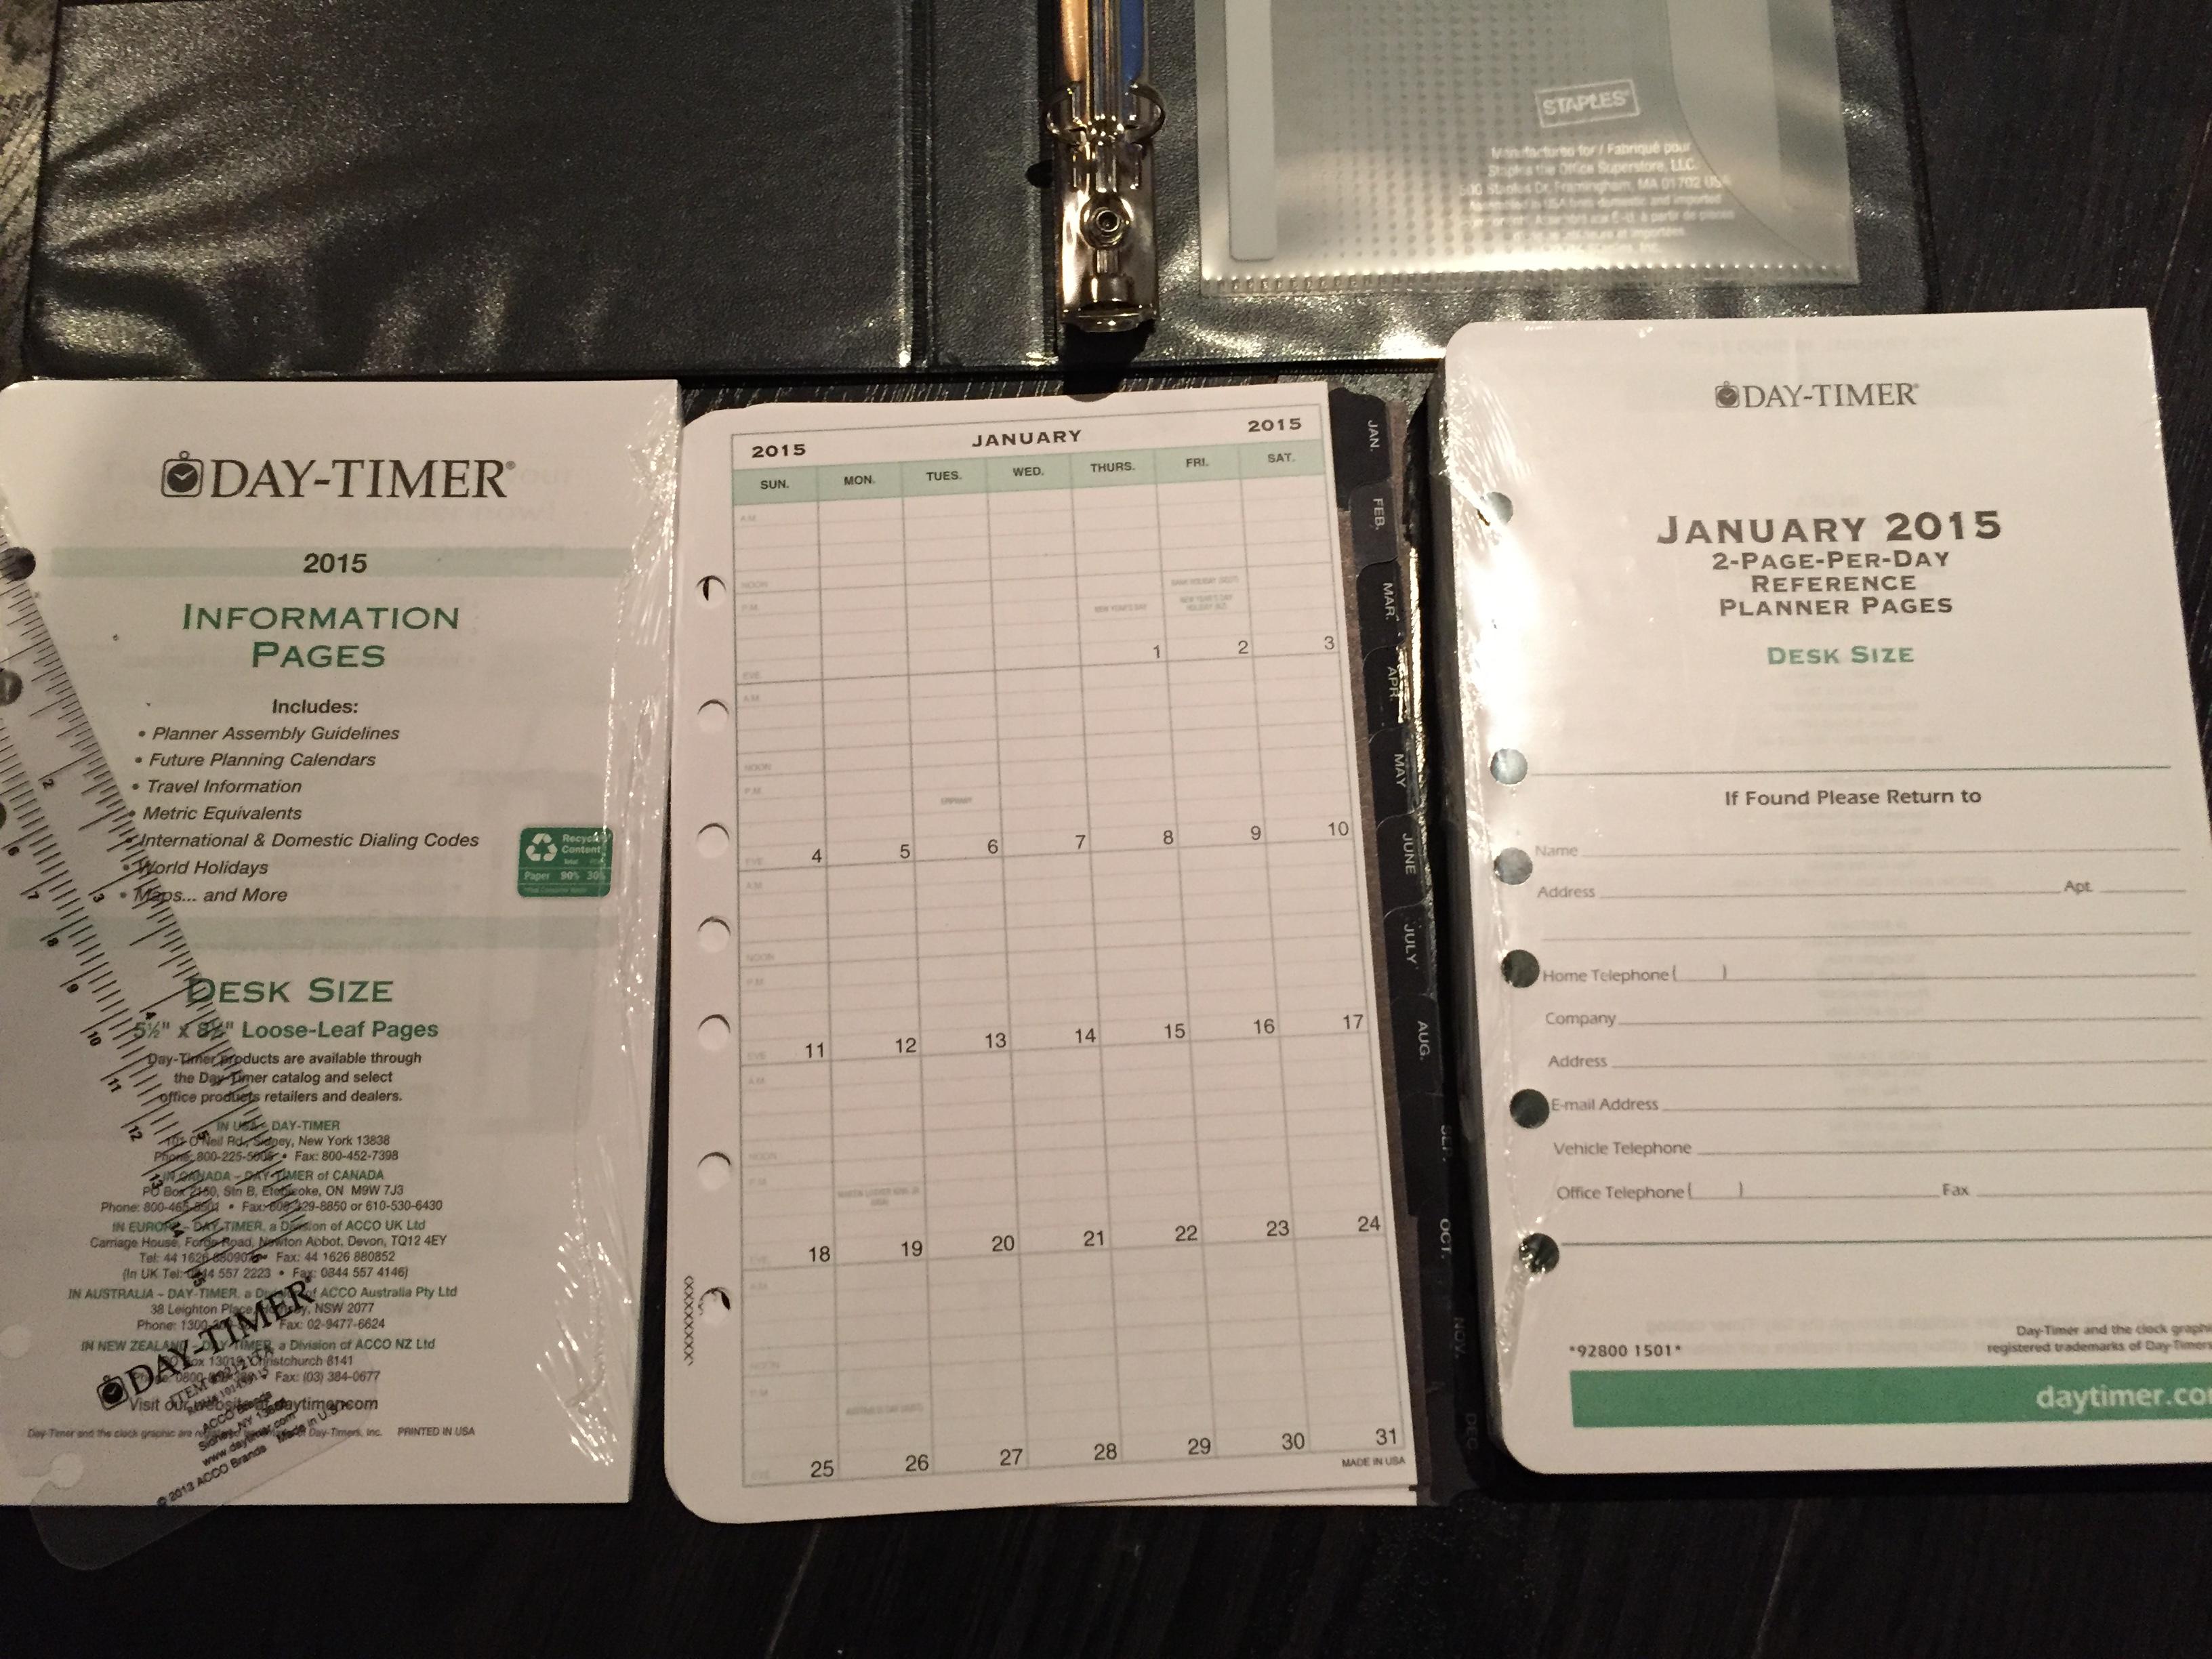 My DIY Planner – Daytimer Planner